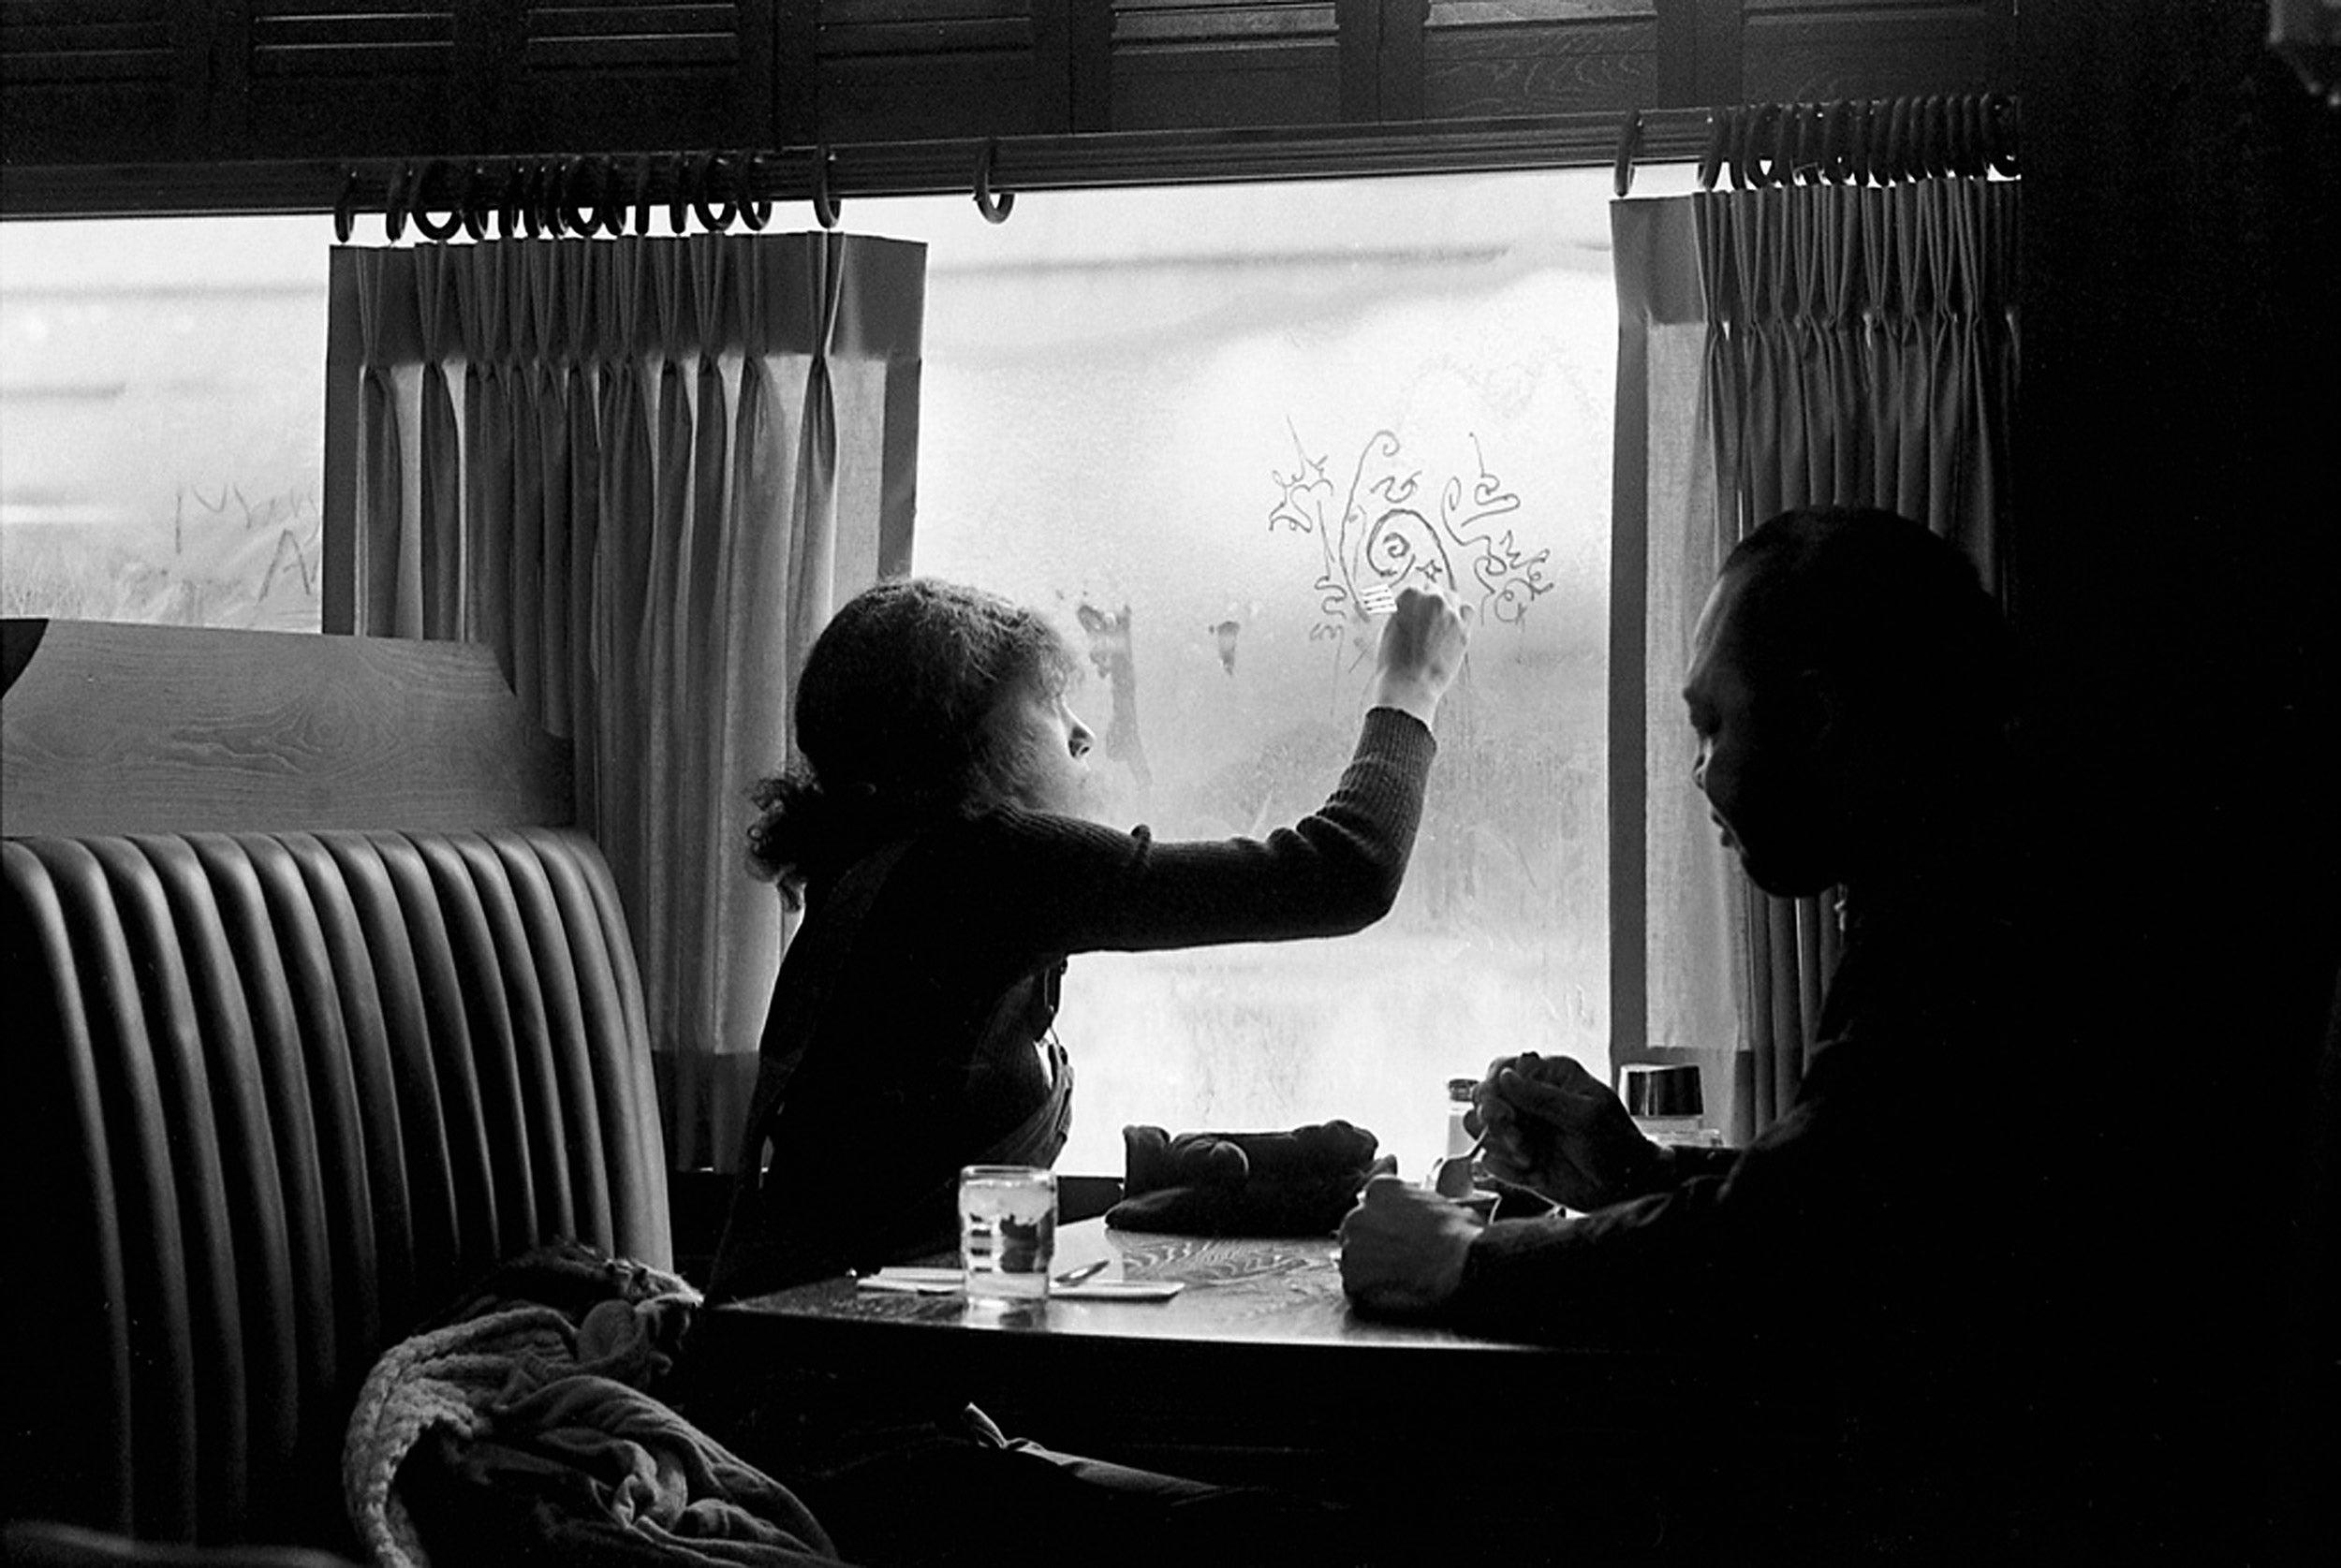 Woman in restaurant booth doodles in window fog, 1969.